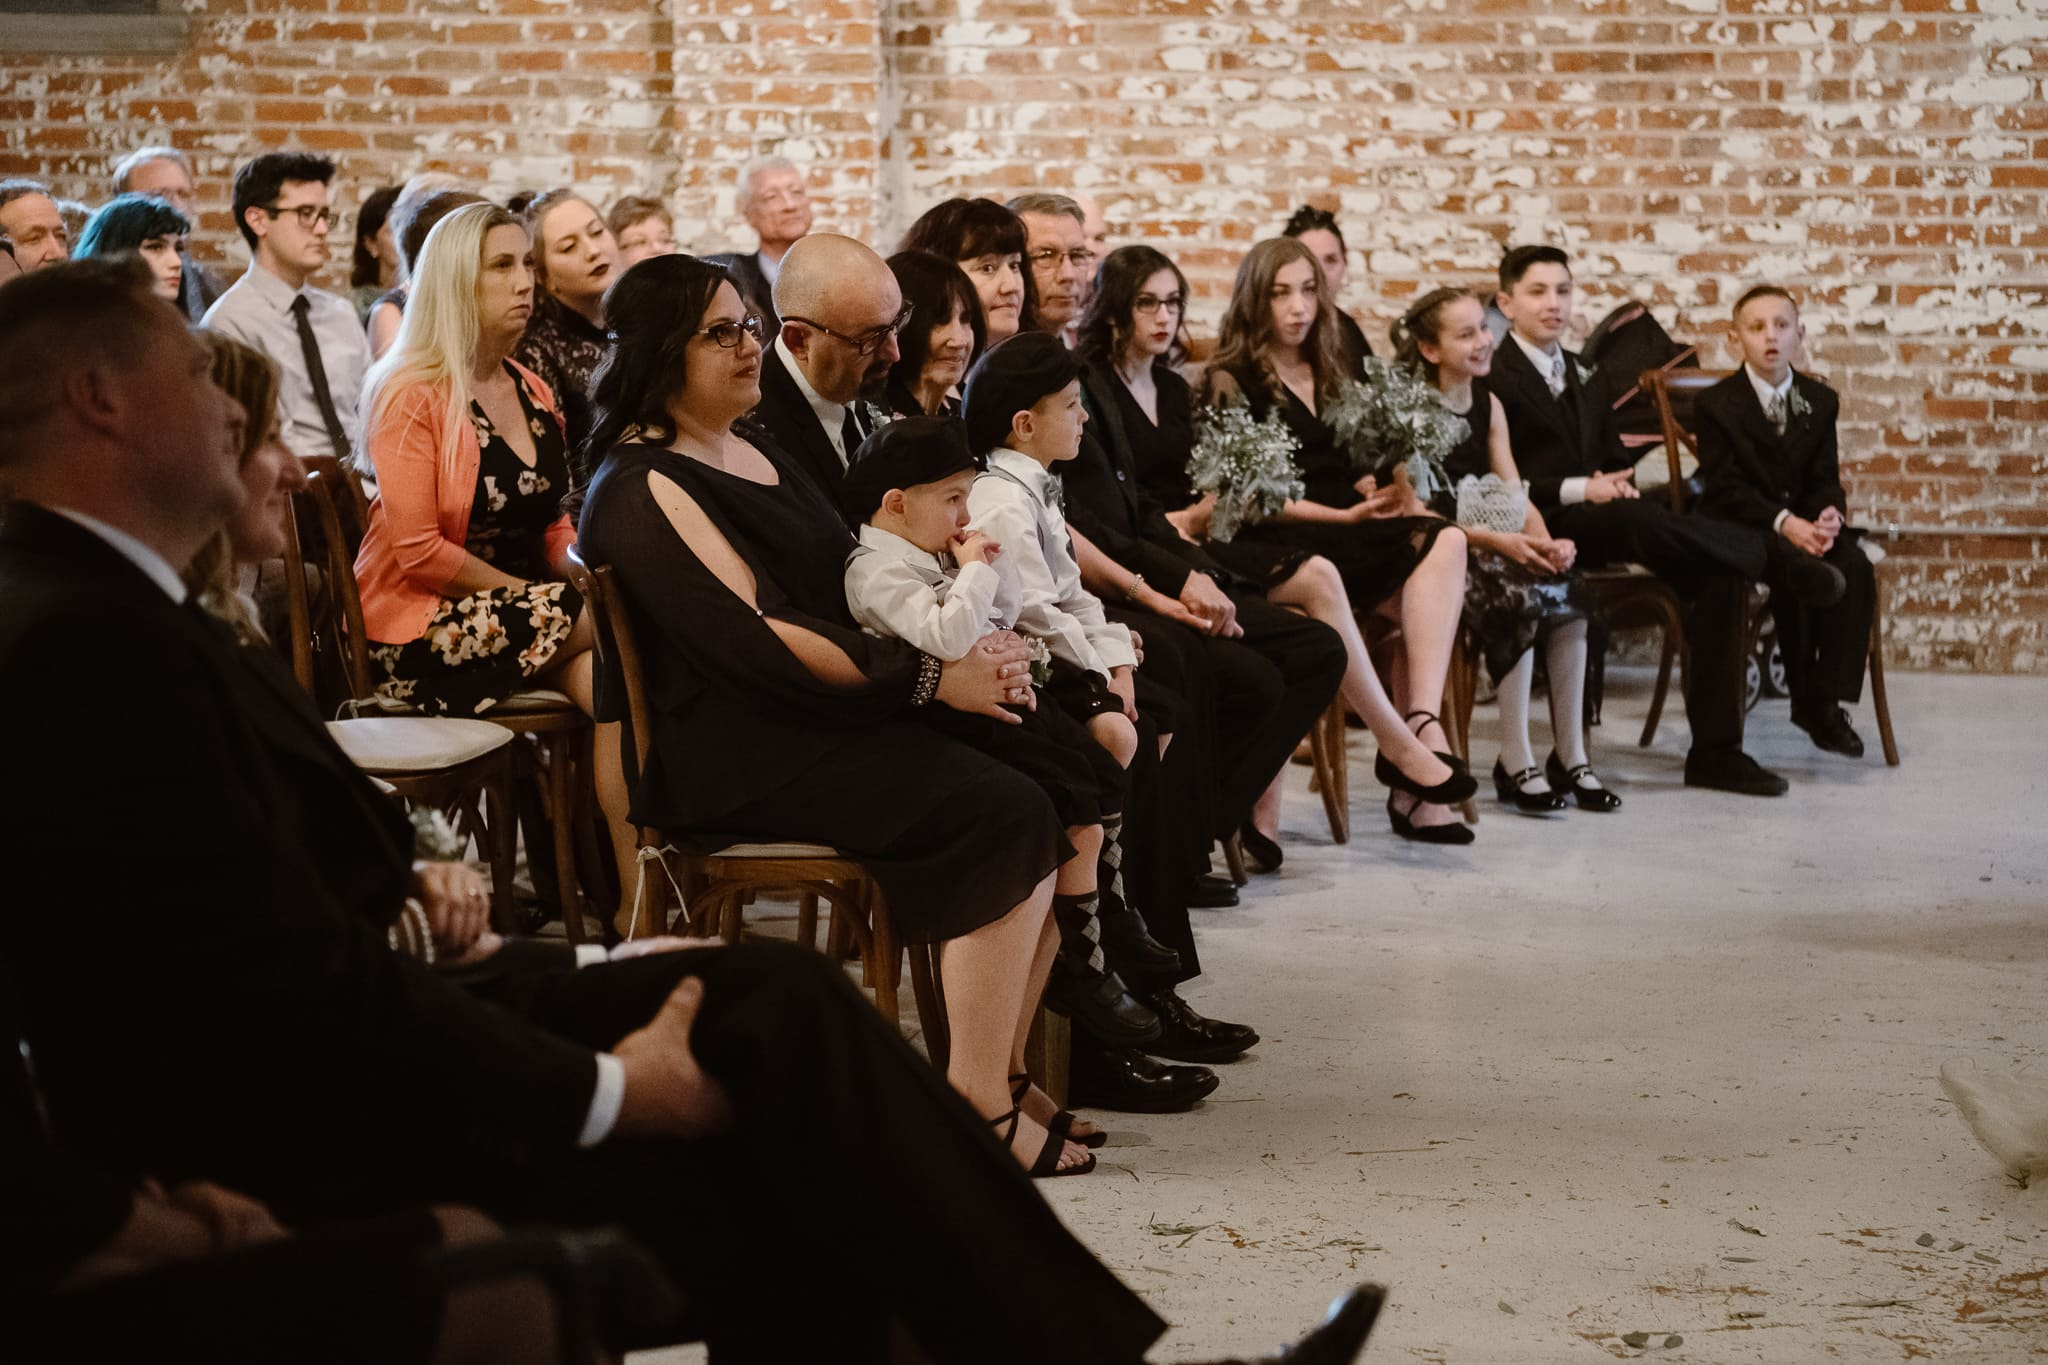 St Vrain Wedding Photographer | Longmont Wedding Photographer | Colorado Winter Wedding Photographer, Colorado industrial chic wedding ceremony, family watching ceremony